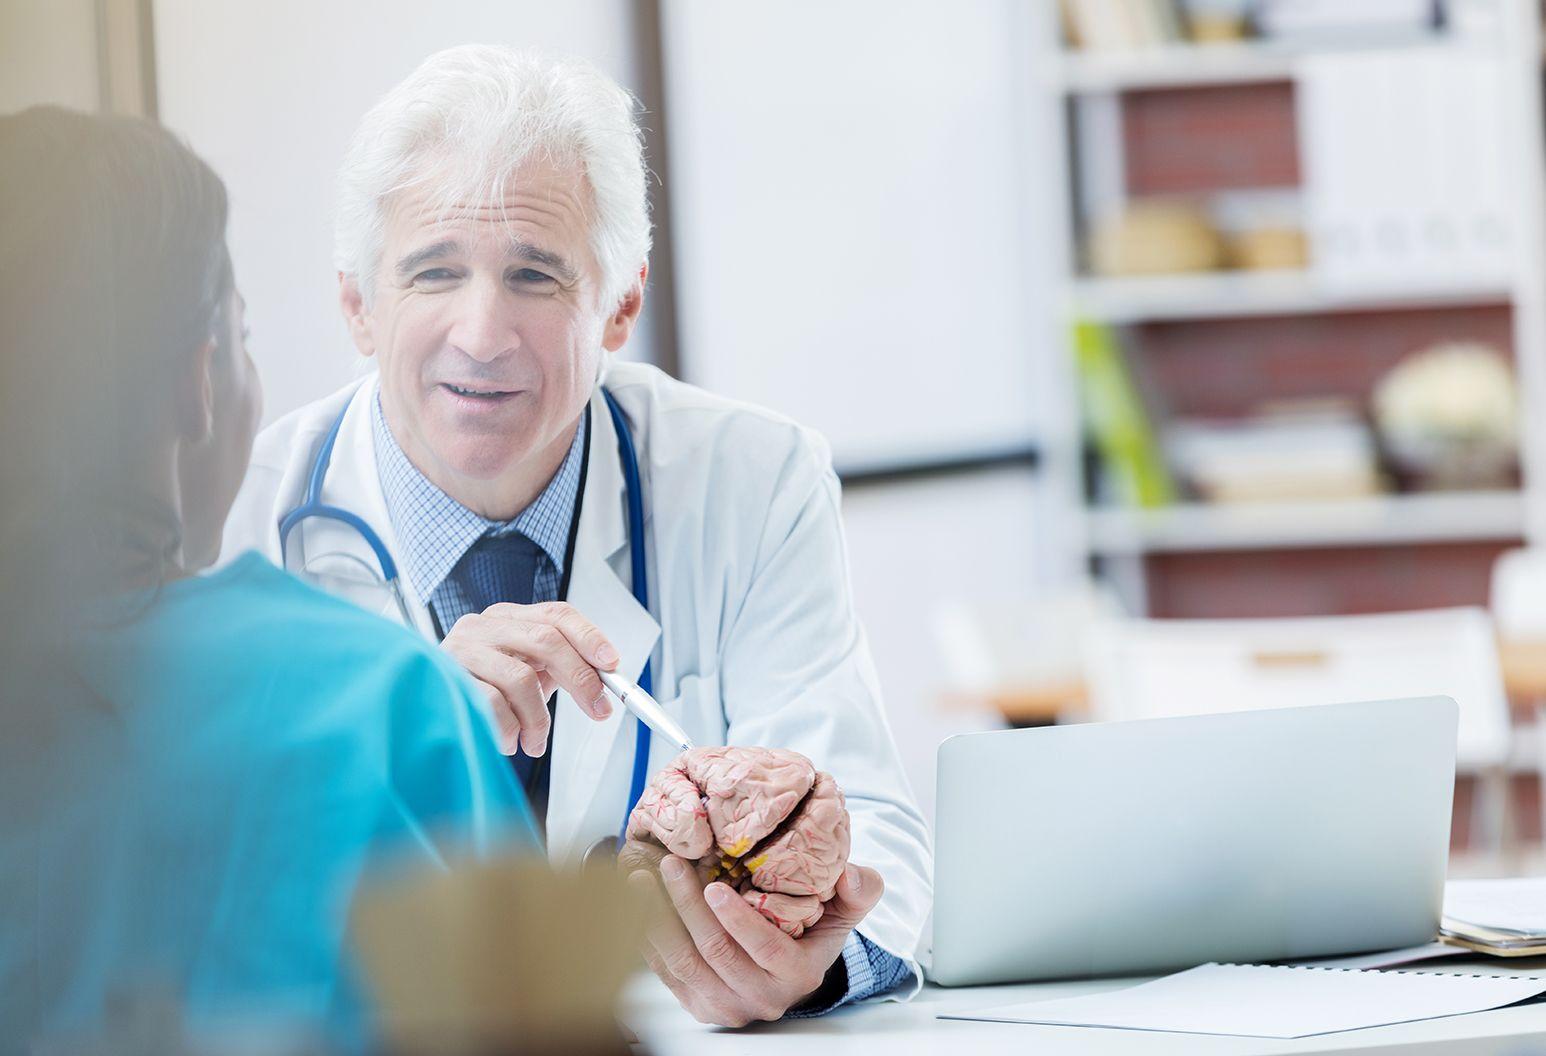 What treats angiosurgeon, what symptoms to treat 62